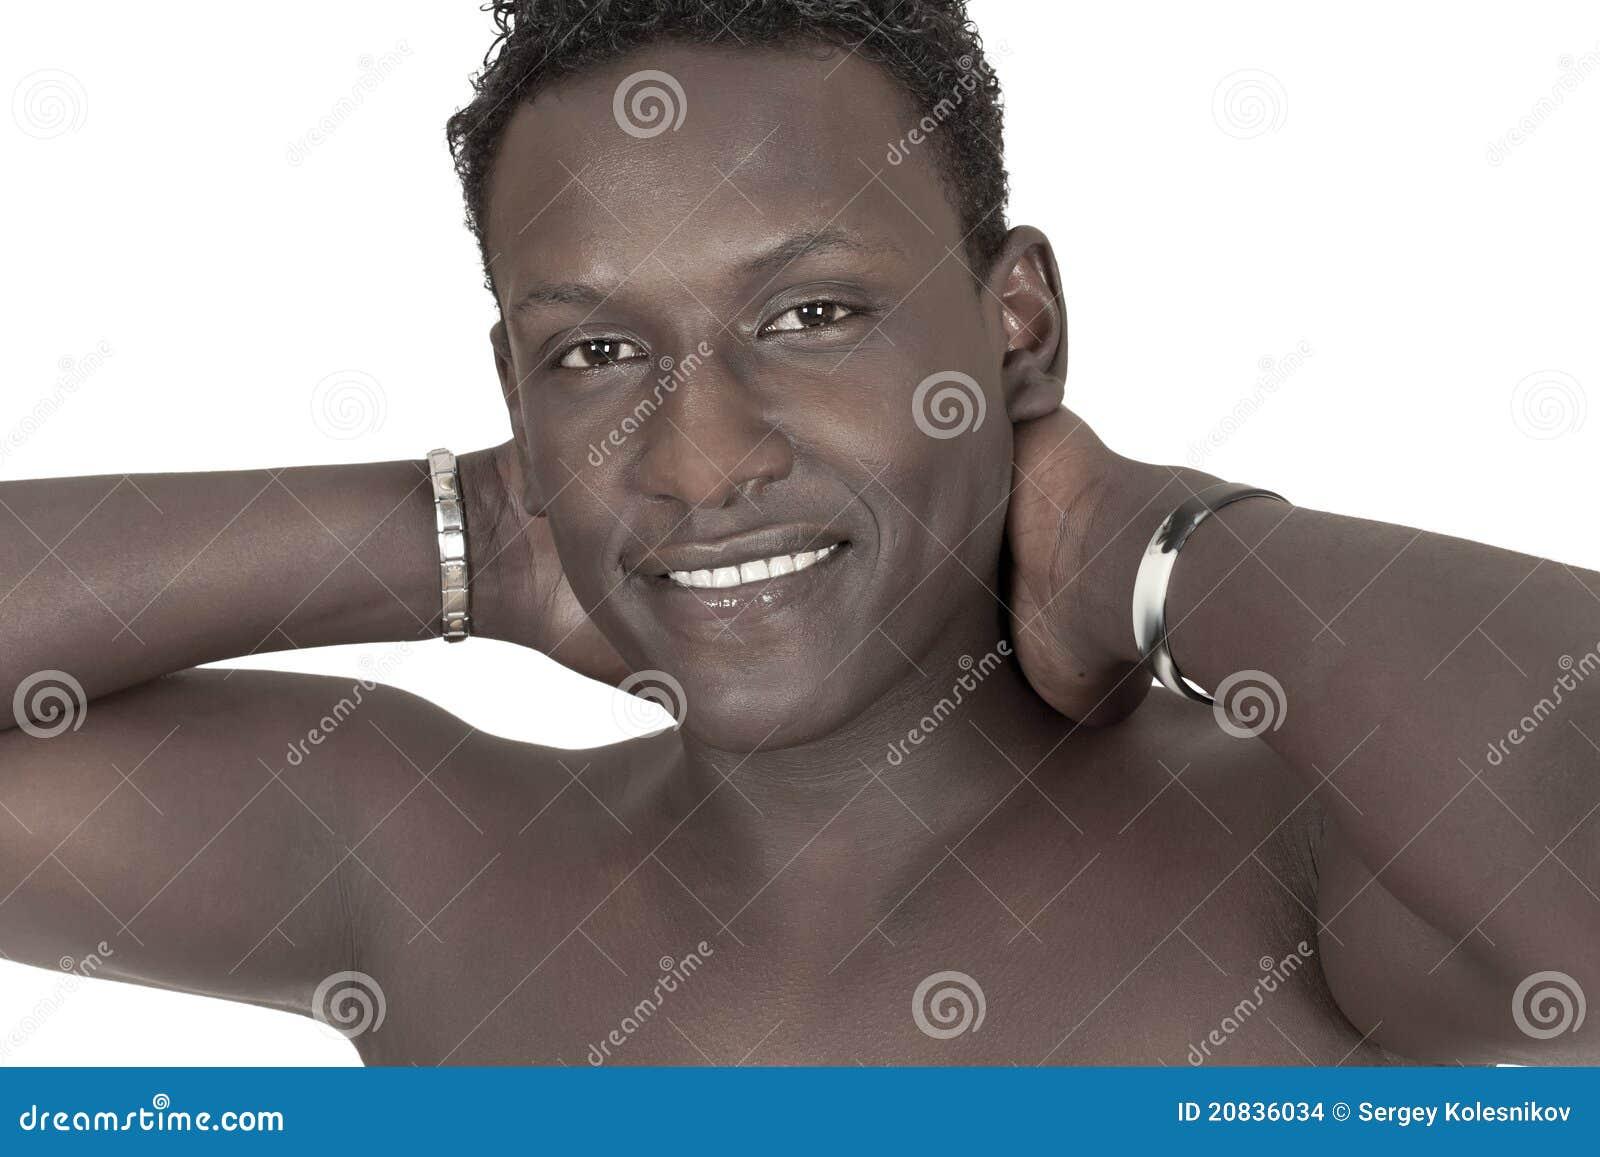 Хочу темнокожего парня 11 фотография